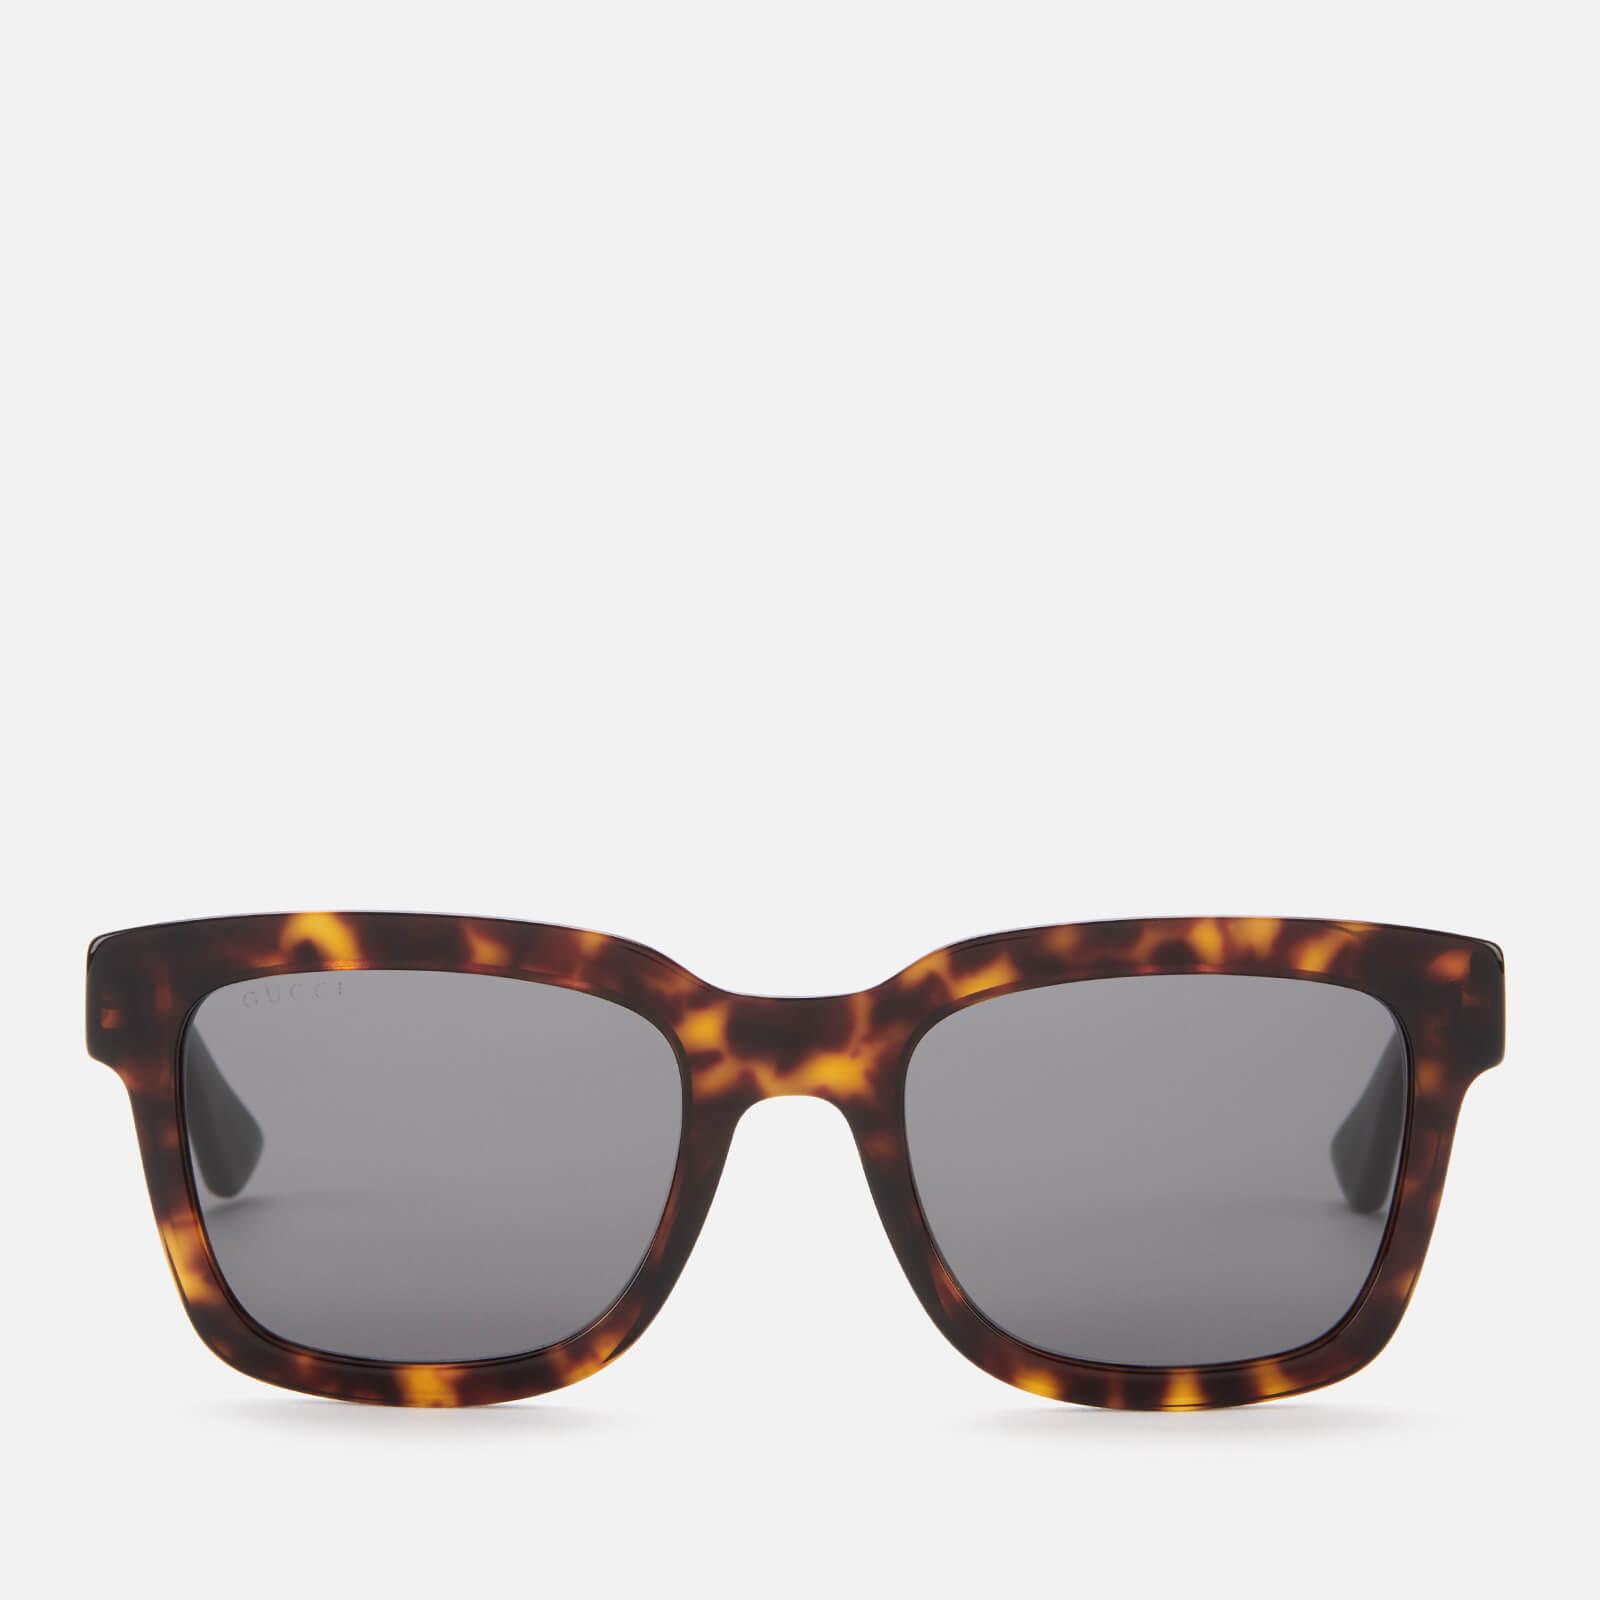 Gucci Men's Acetate Square Frame Sunglasses - Havana/Green/Grey